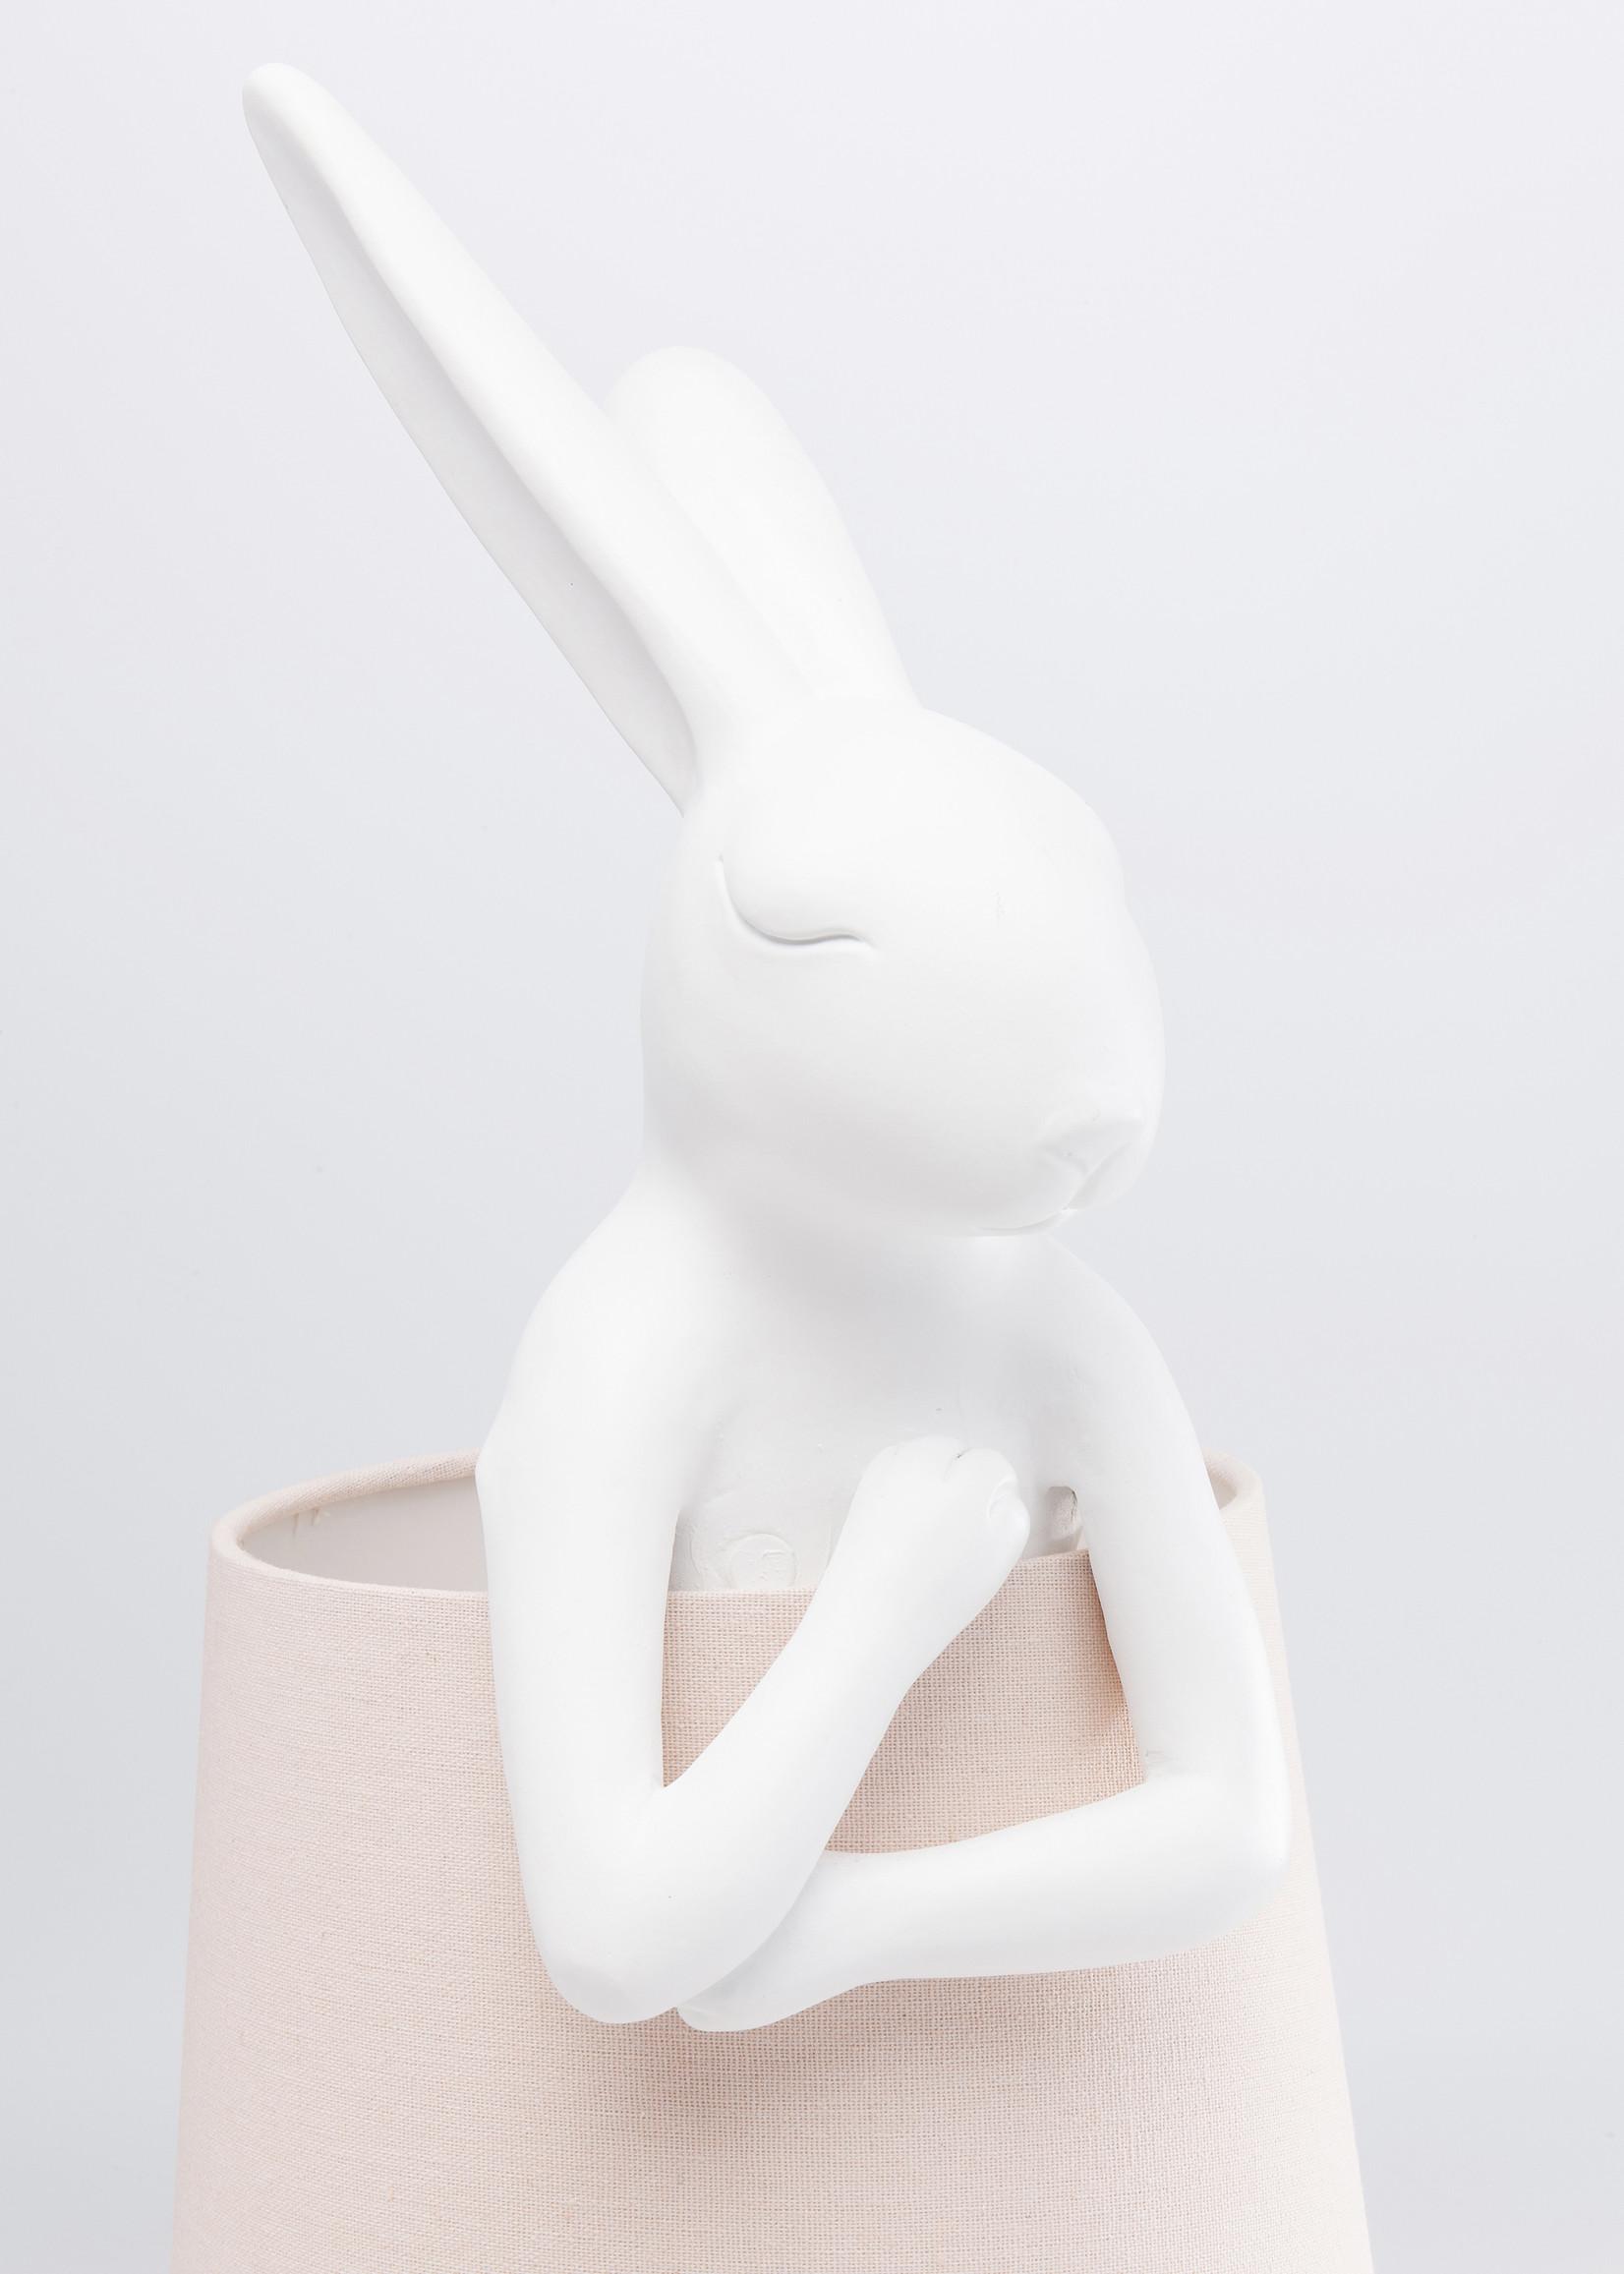 KARE DESIGN Table Lamp Animal Rabbit White